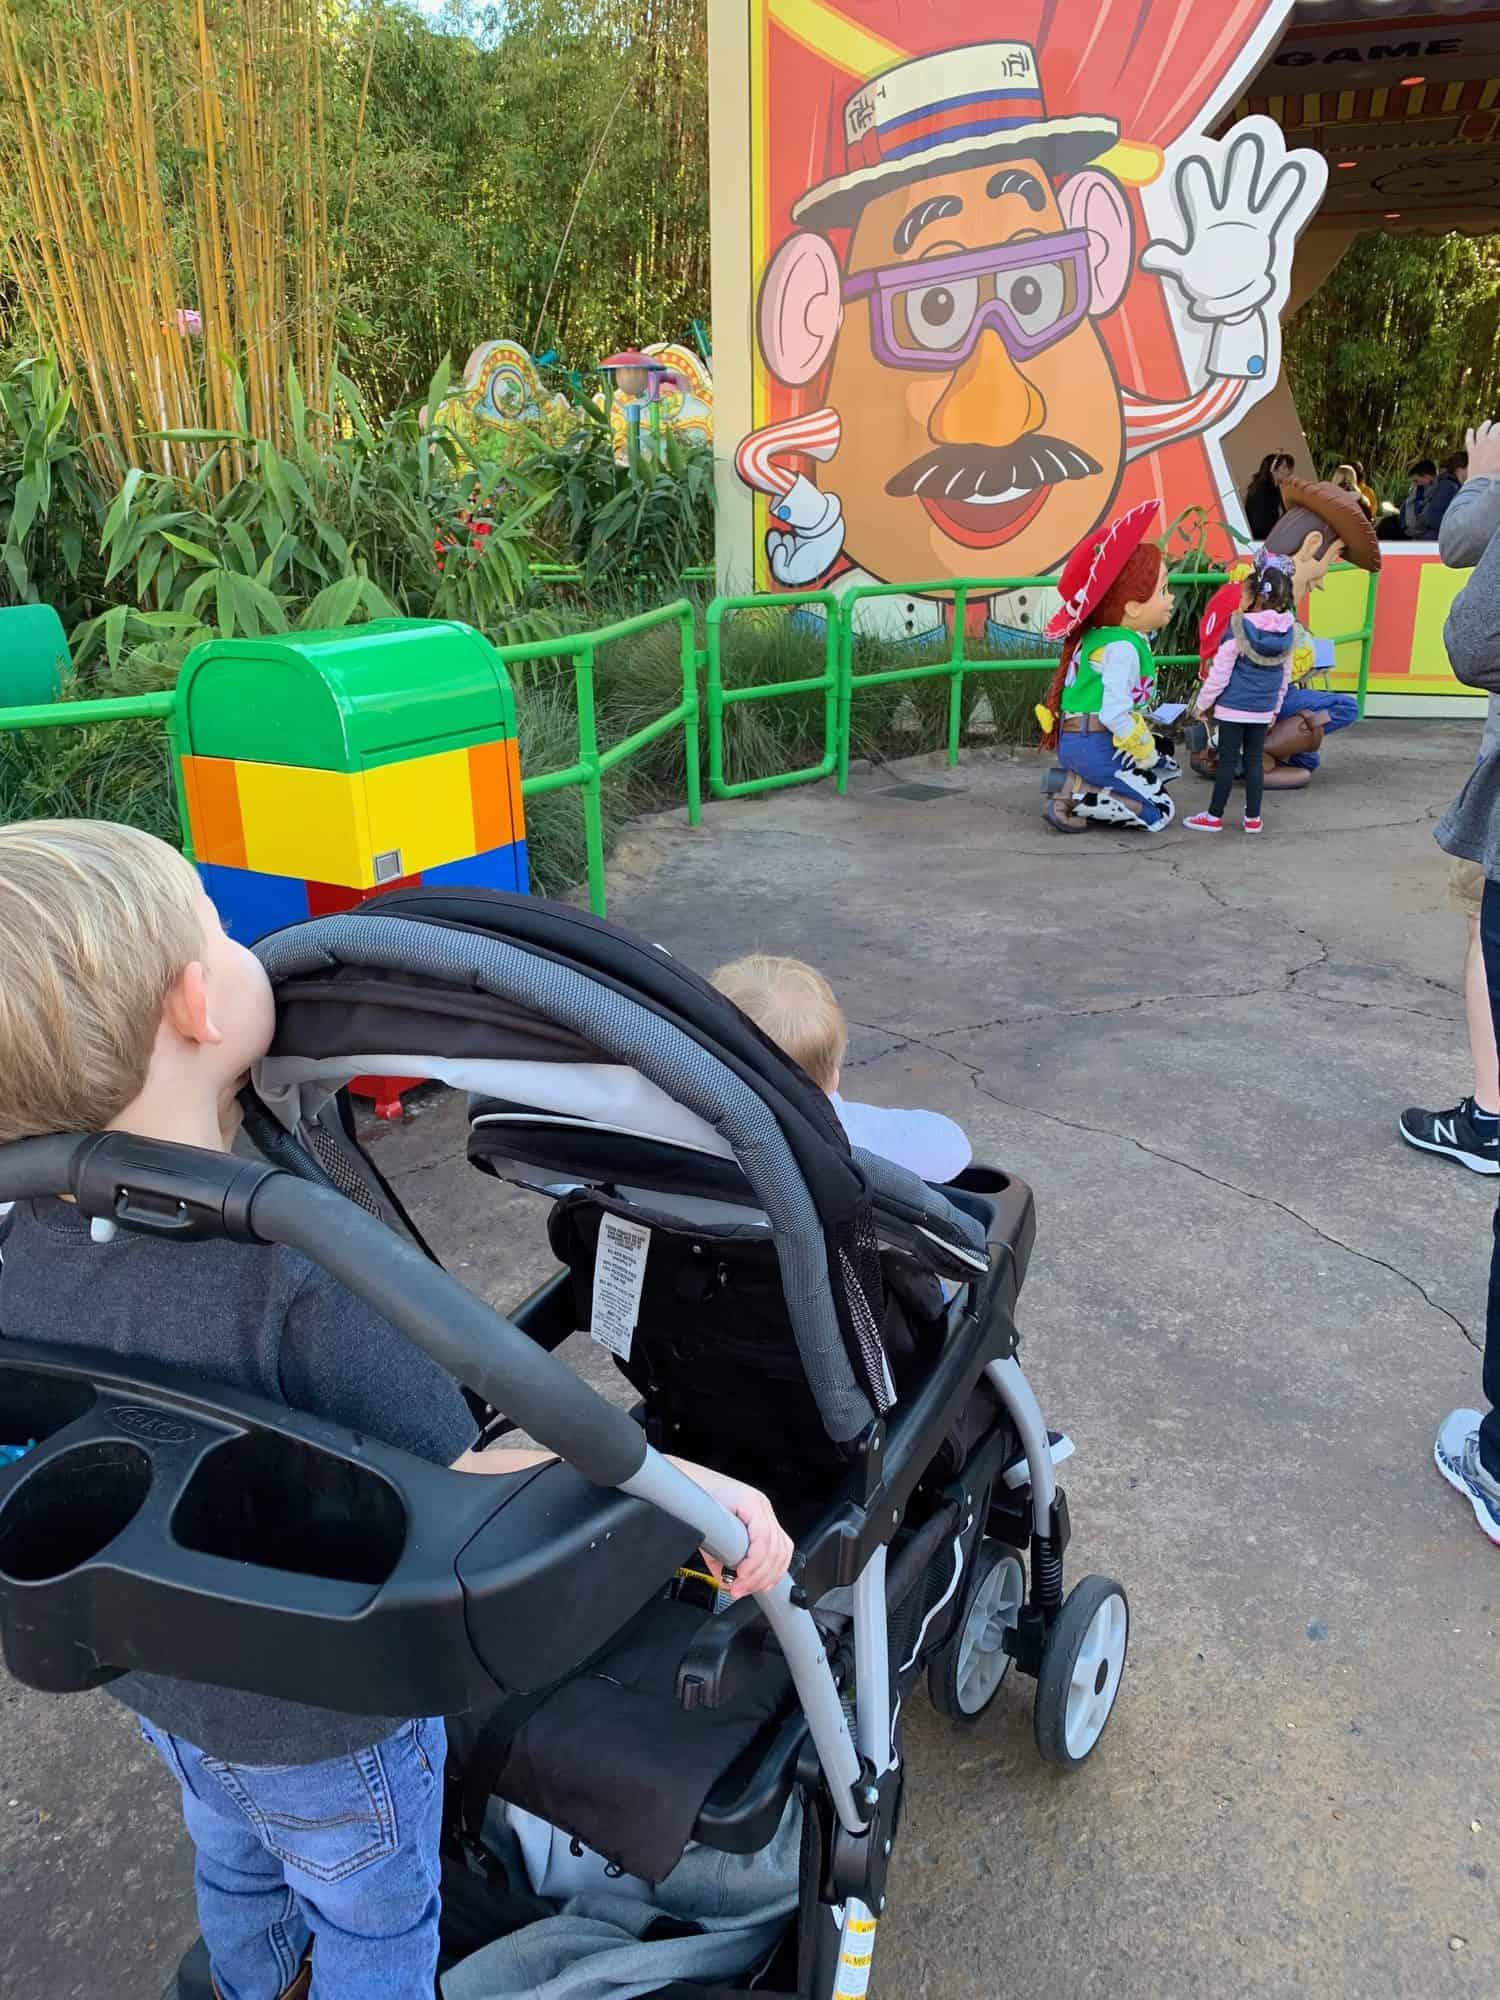 Best Stroller for Disney World • WDW Vacation Tips